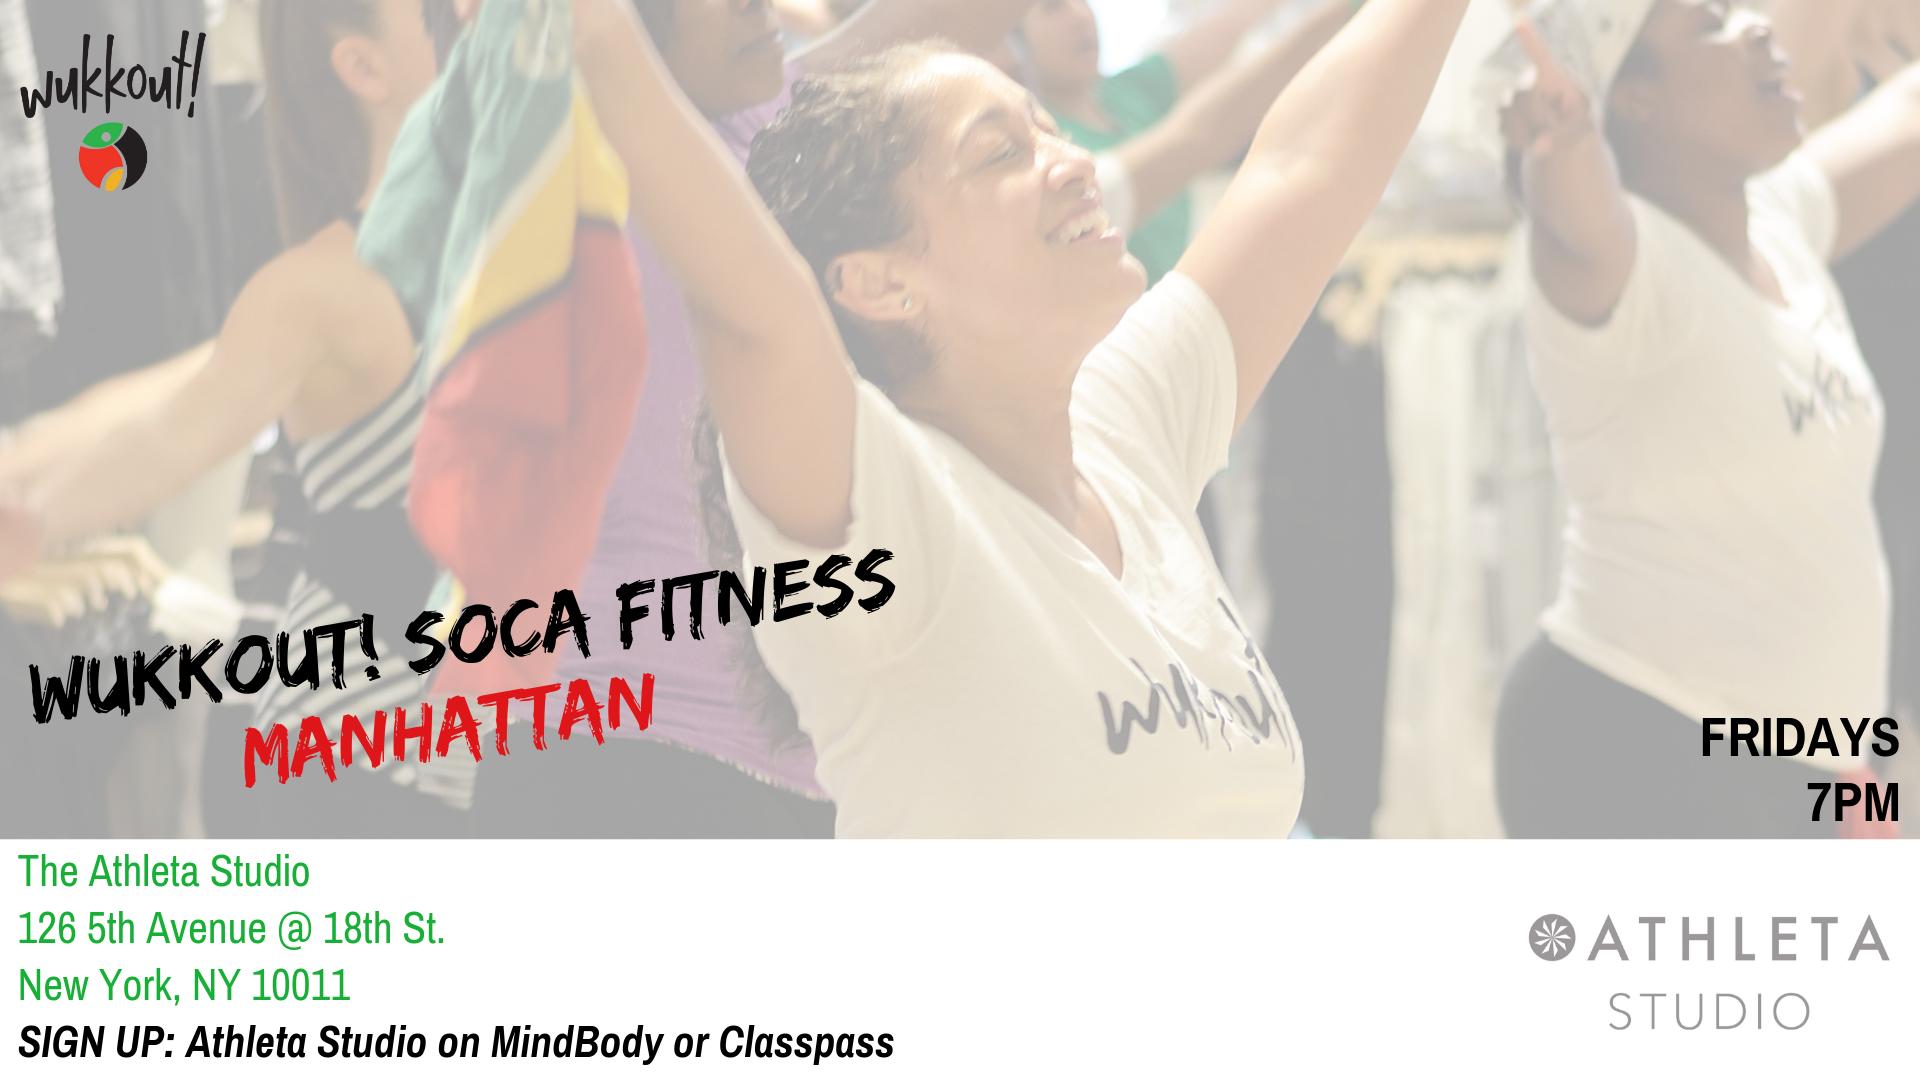 Wukkout!® Soca Fitness_ Athleta - FB Event Cover.png